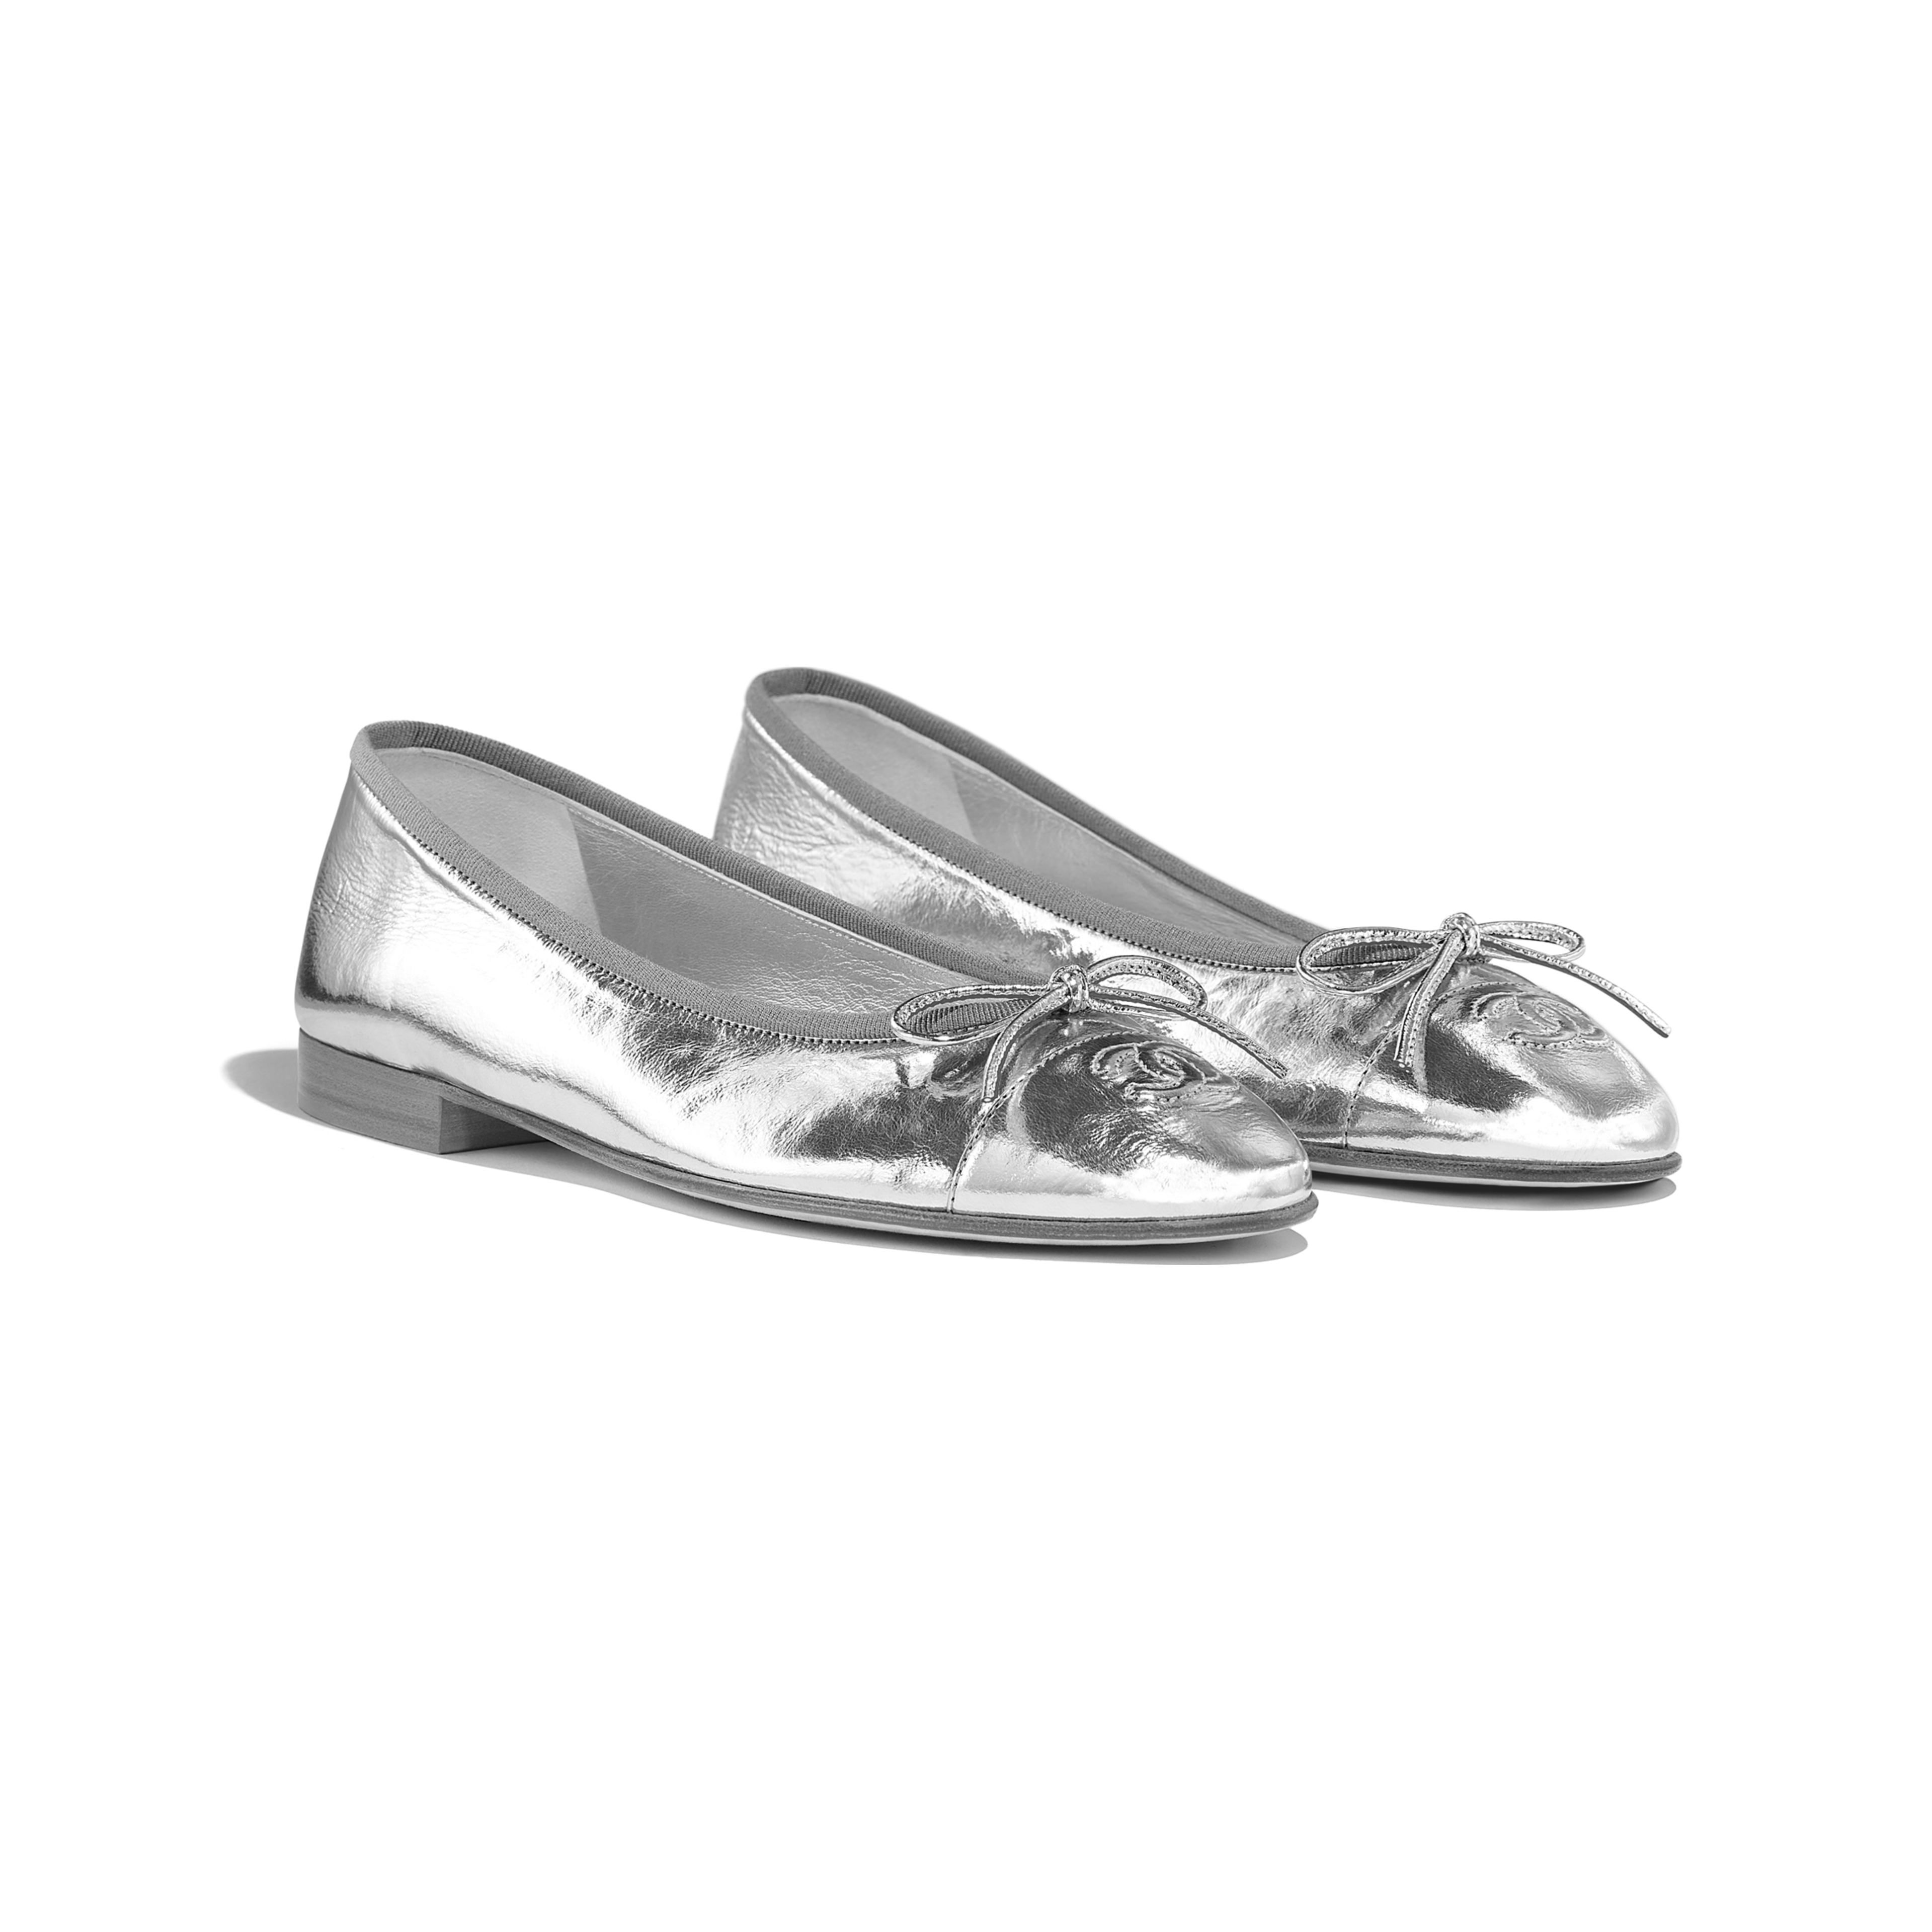 Silver pumps, Ballerina shoes